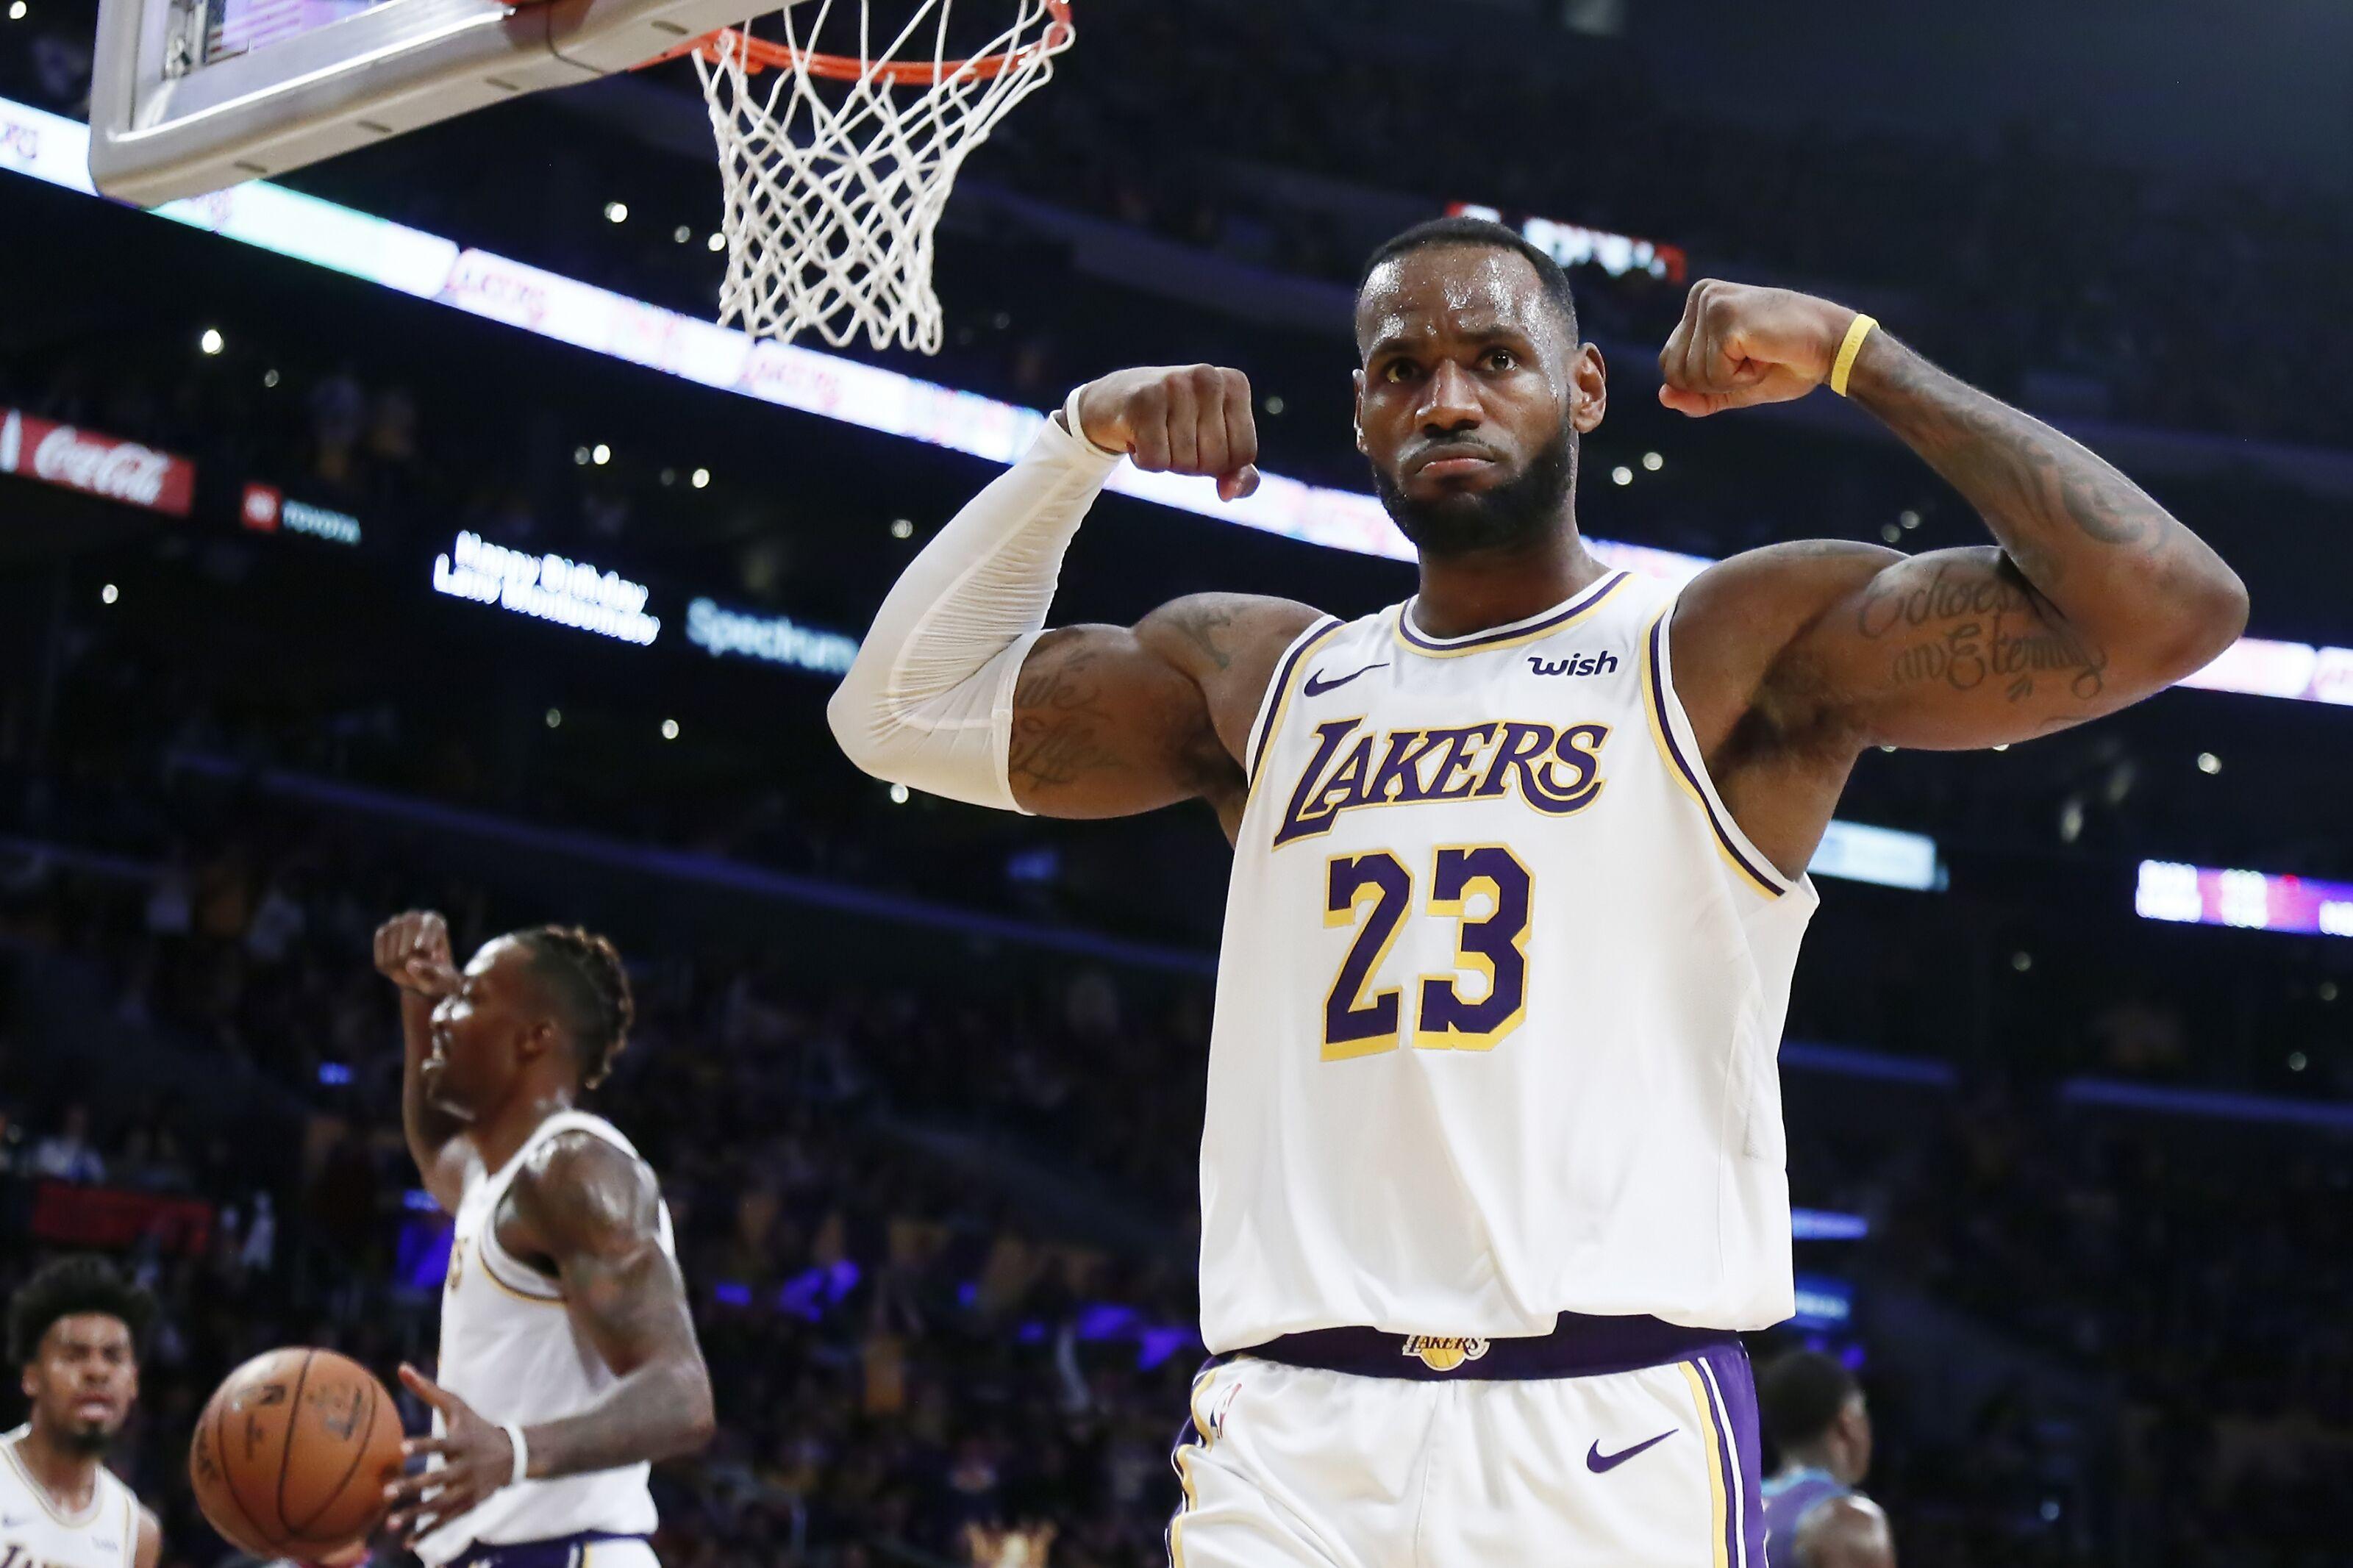 Power rankings the NBA teams through breakfast cereal